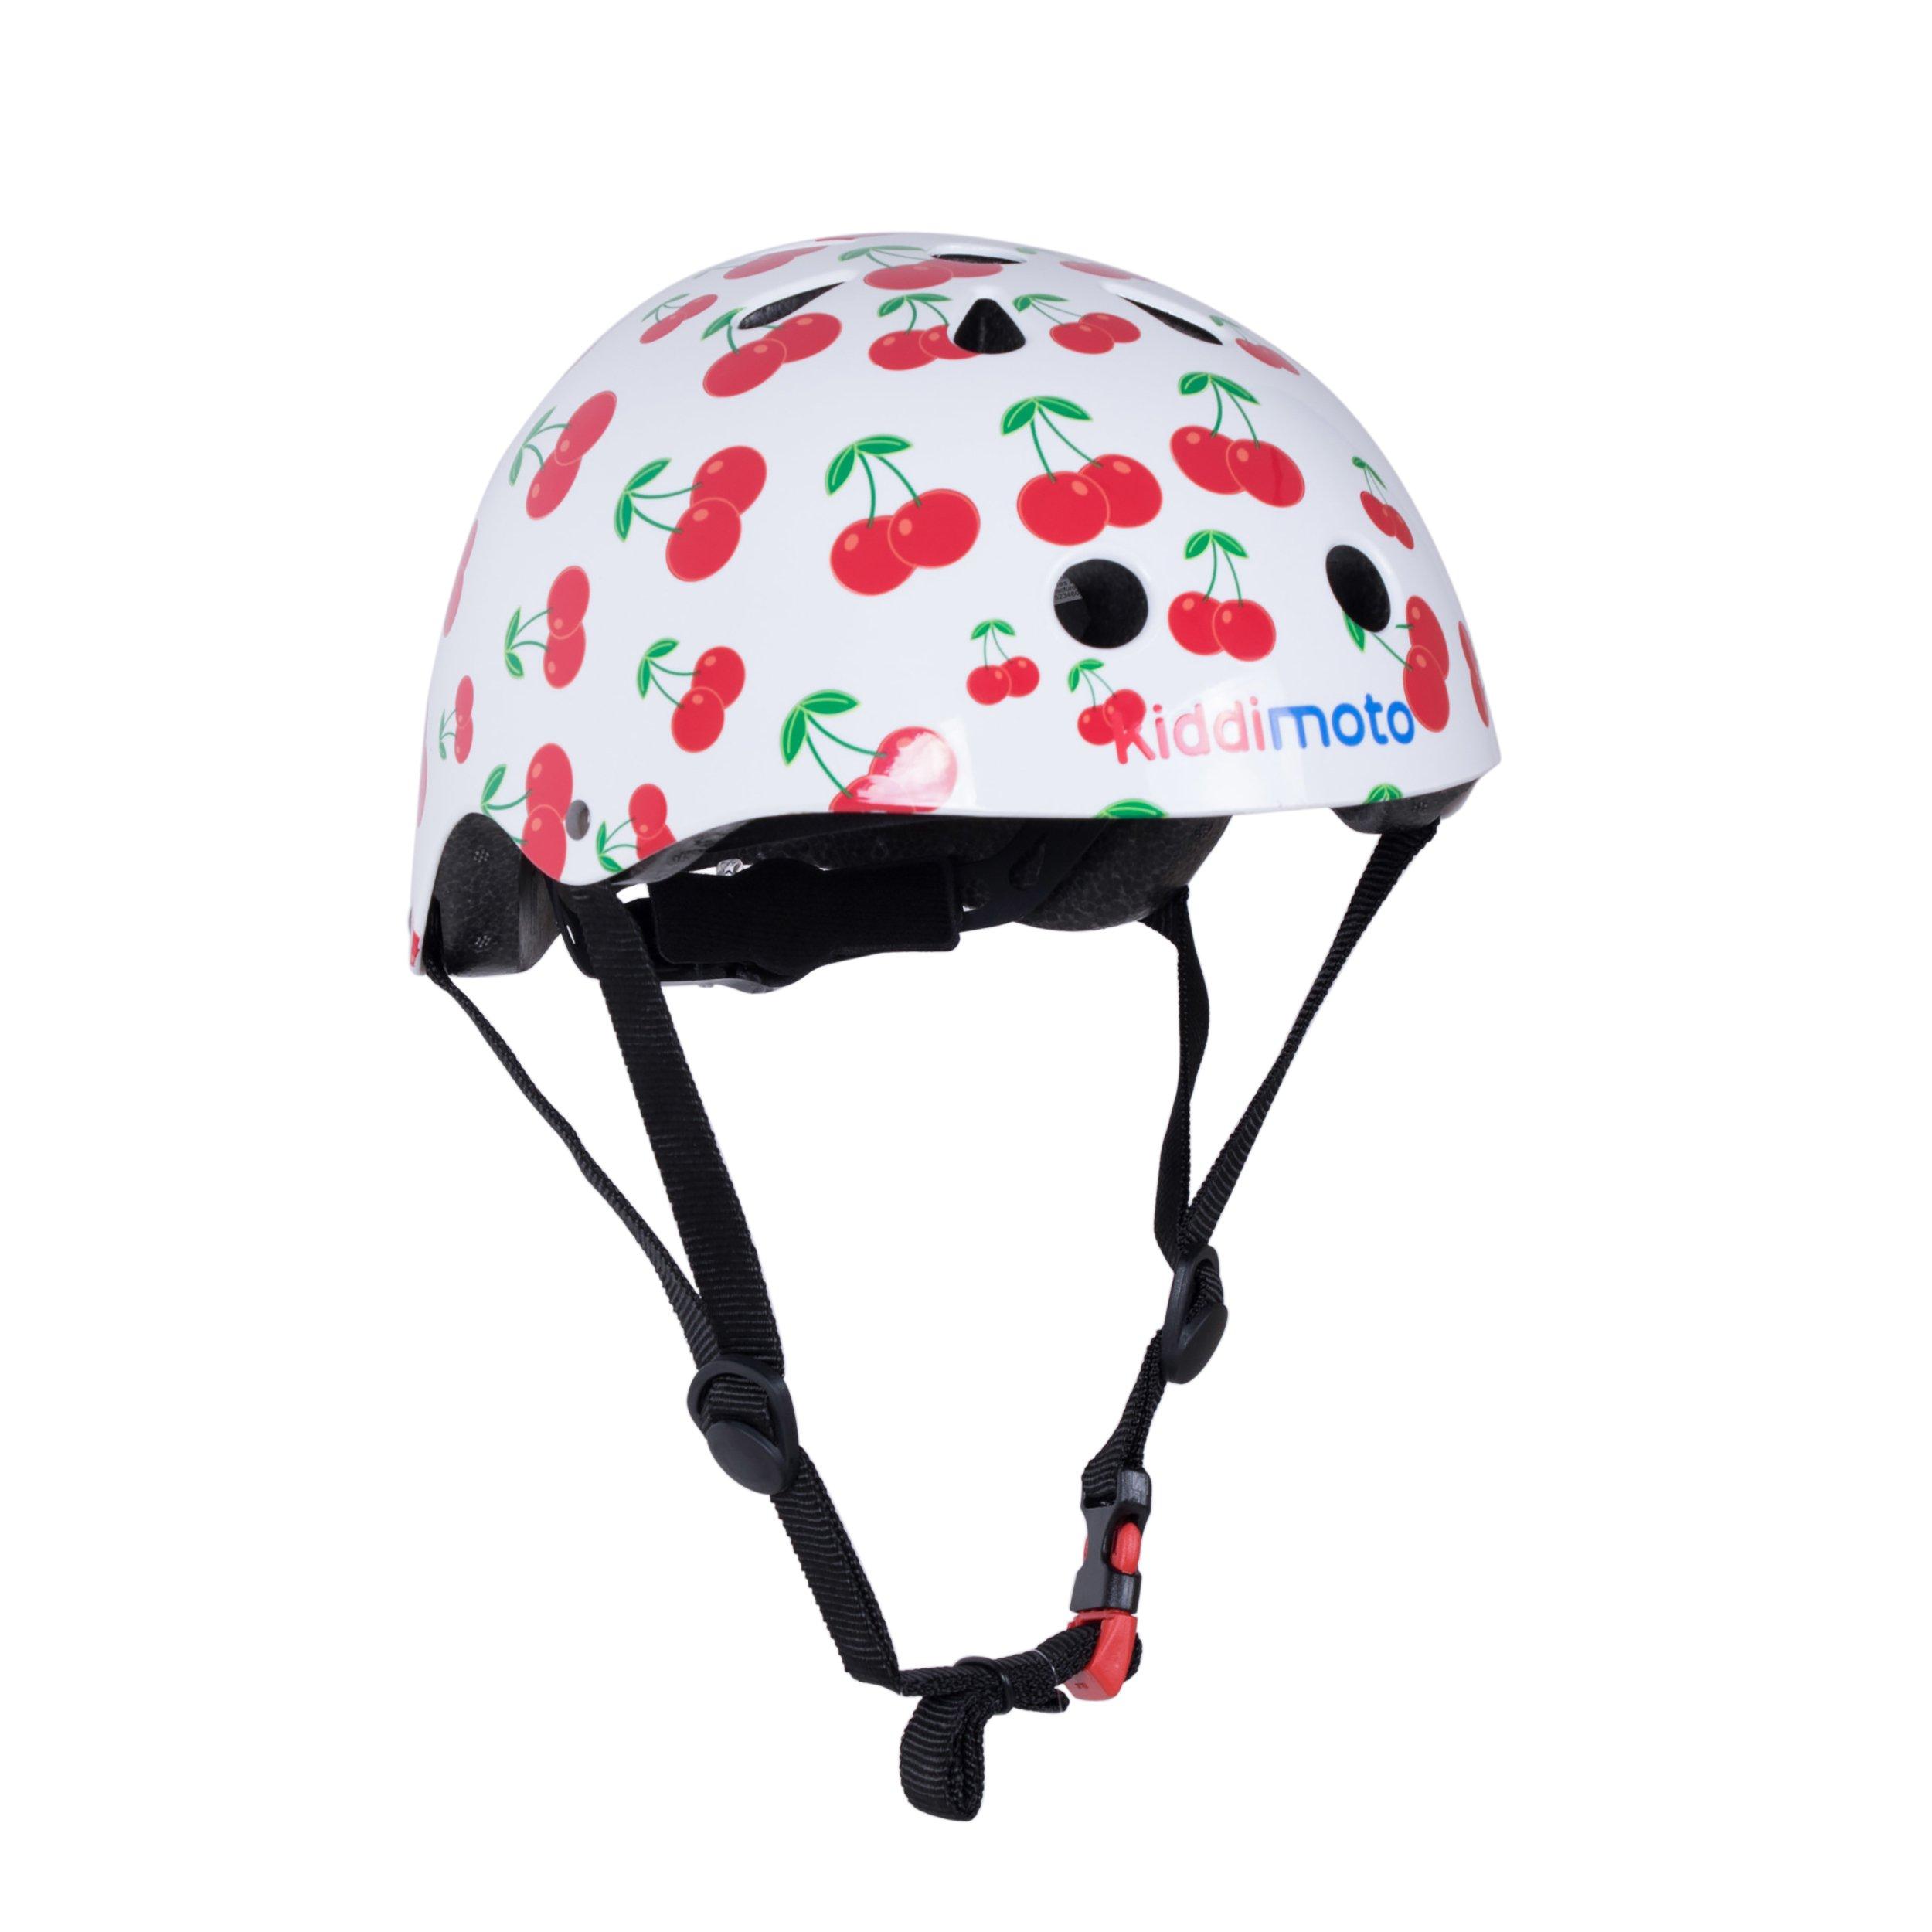 Kiddimoto Kids Patterned Helmet (Cherry, Medium)